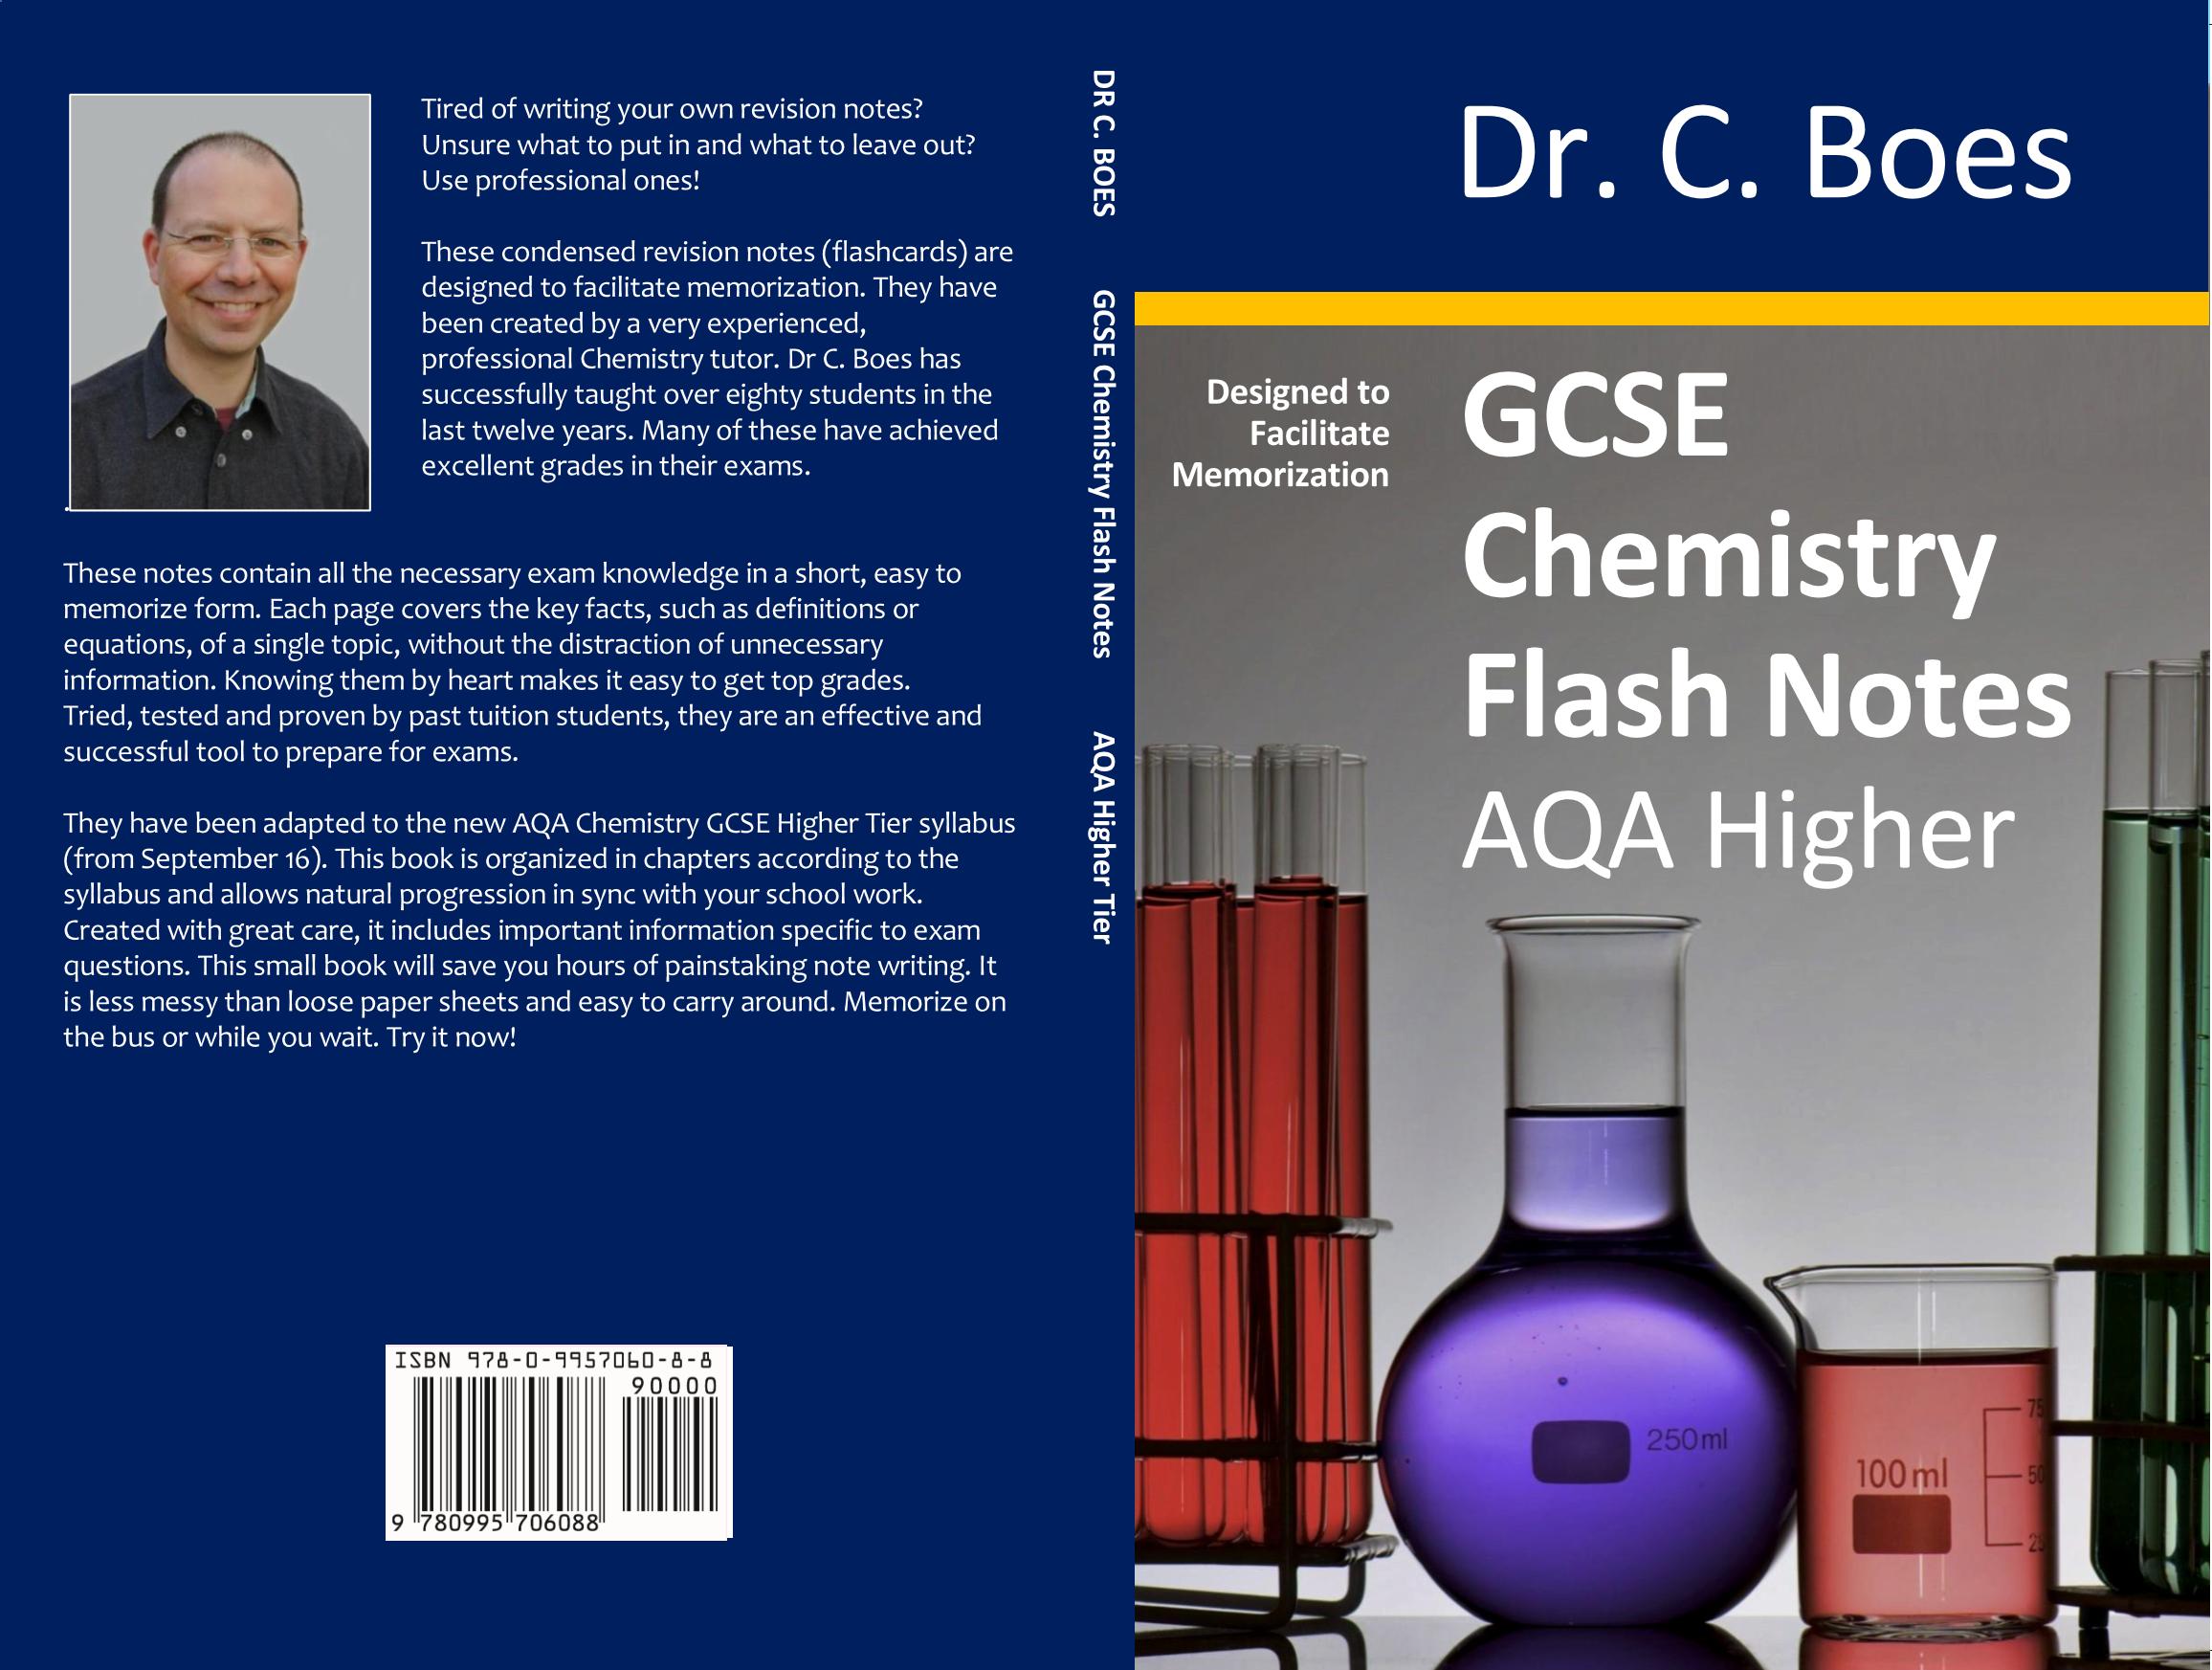 GCSE Chemistry Flash Notes AQA Higher Tier (9-1): Spiral Bound Paperback